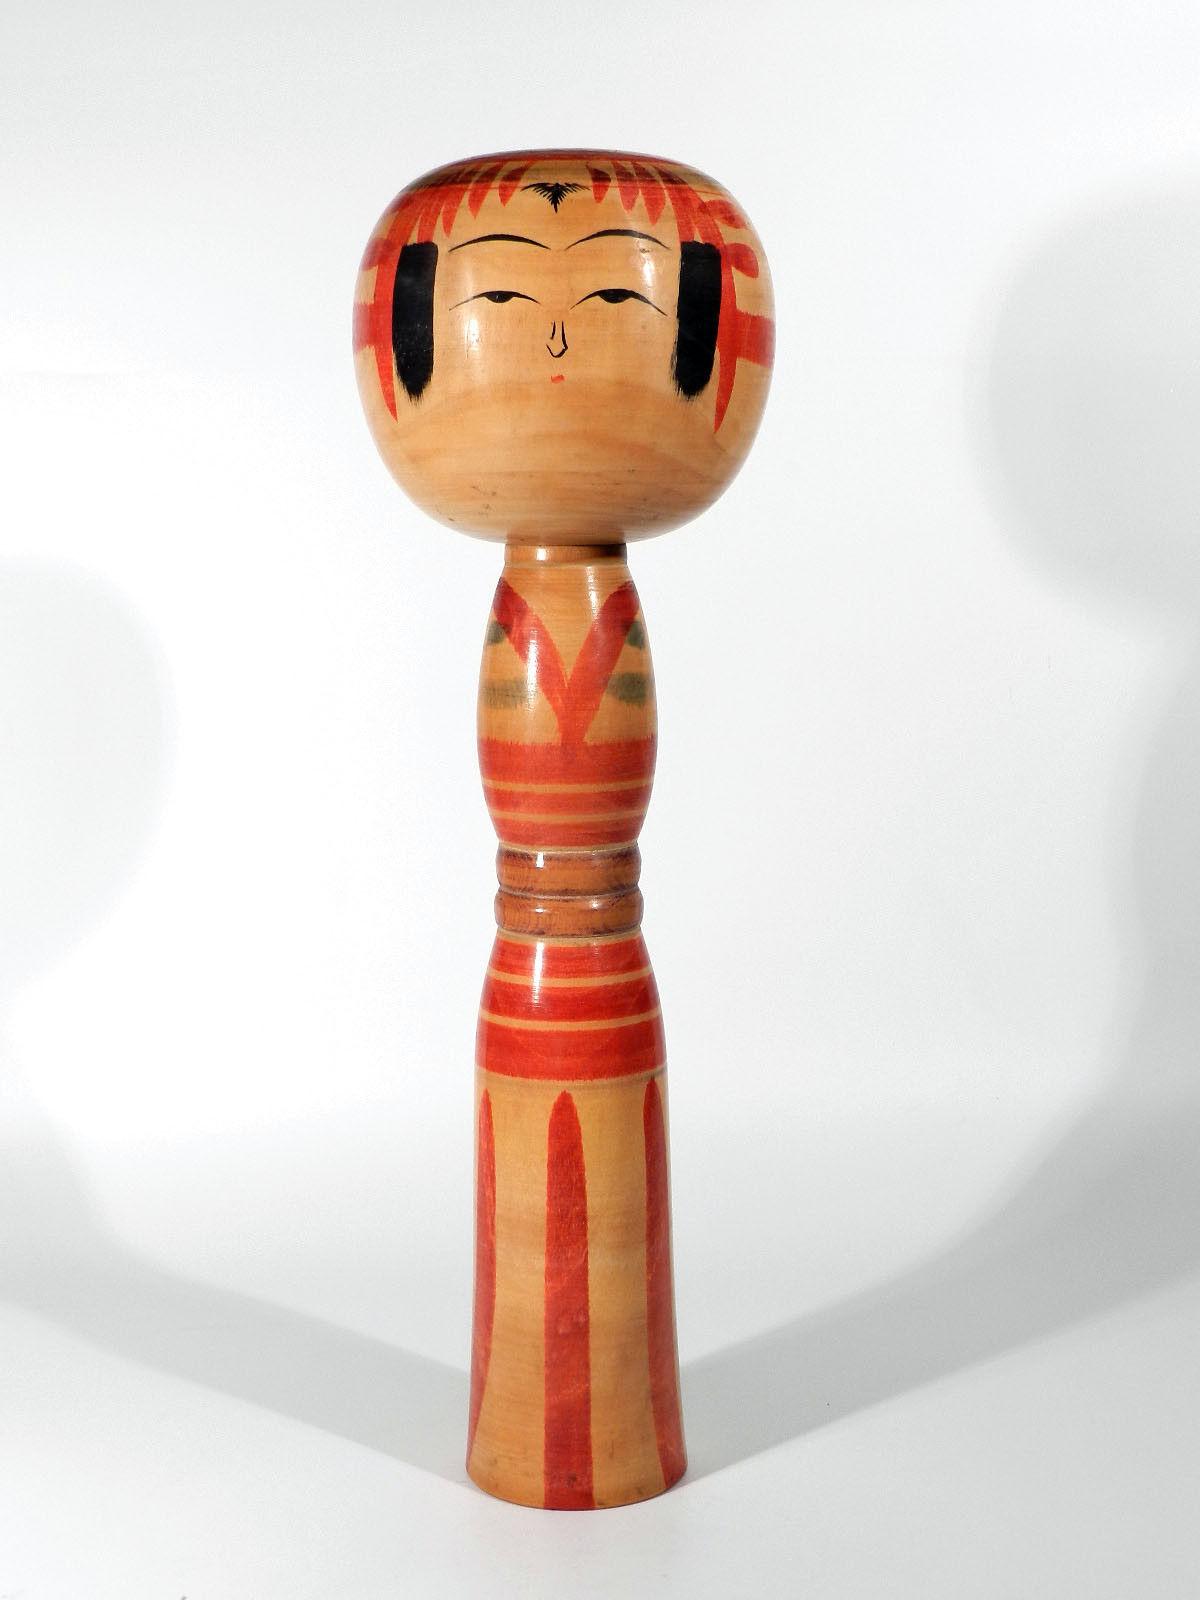 Vintage japón kokeshi madera muñeca °° autografiada única °° Wooden Japanese Doll